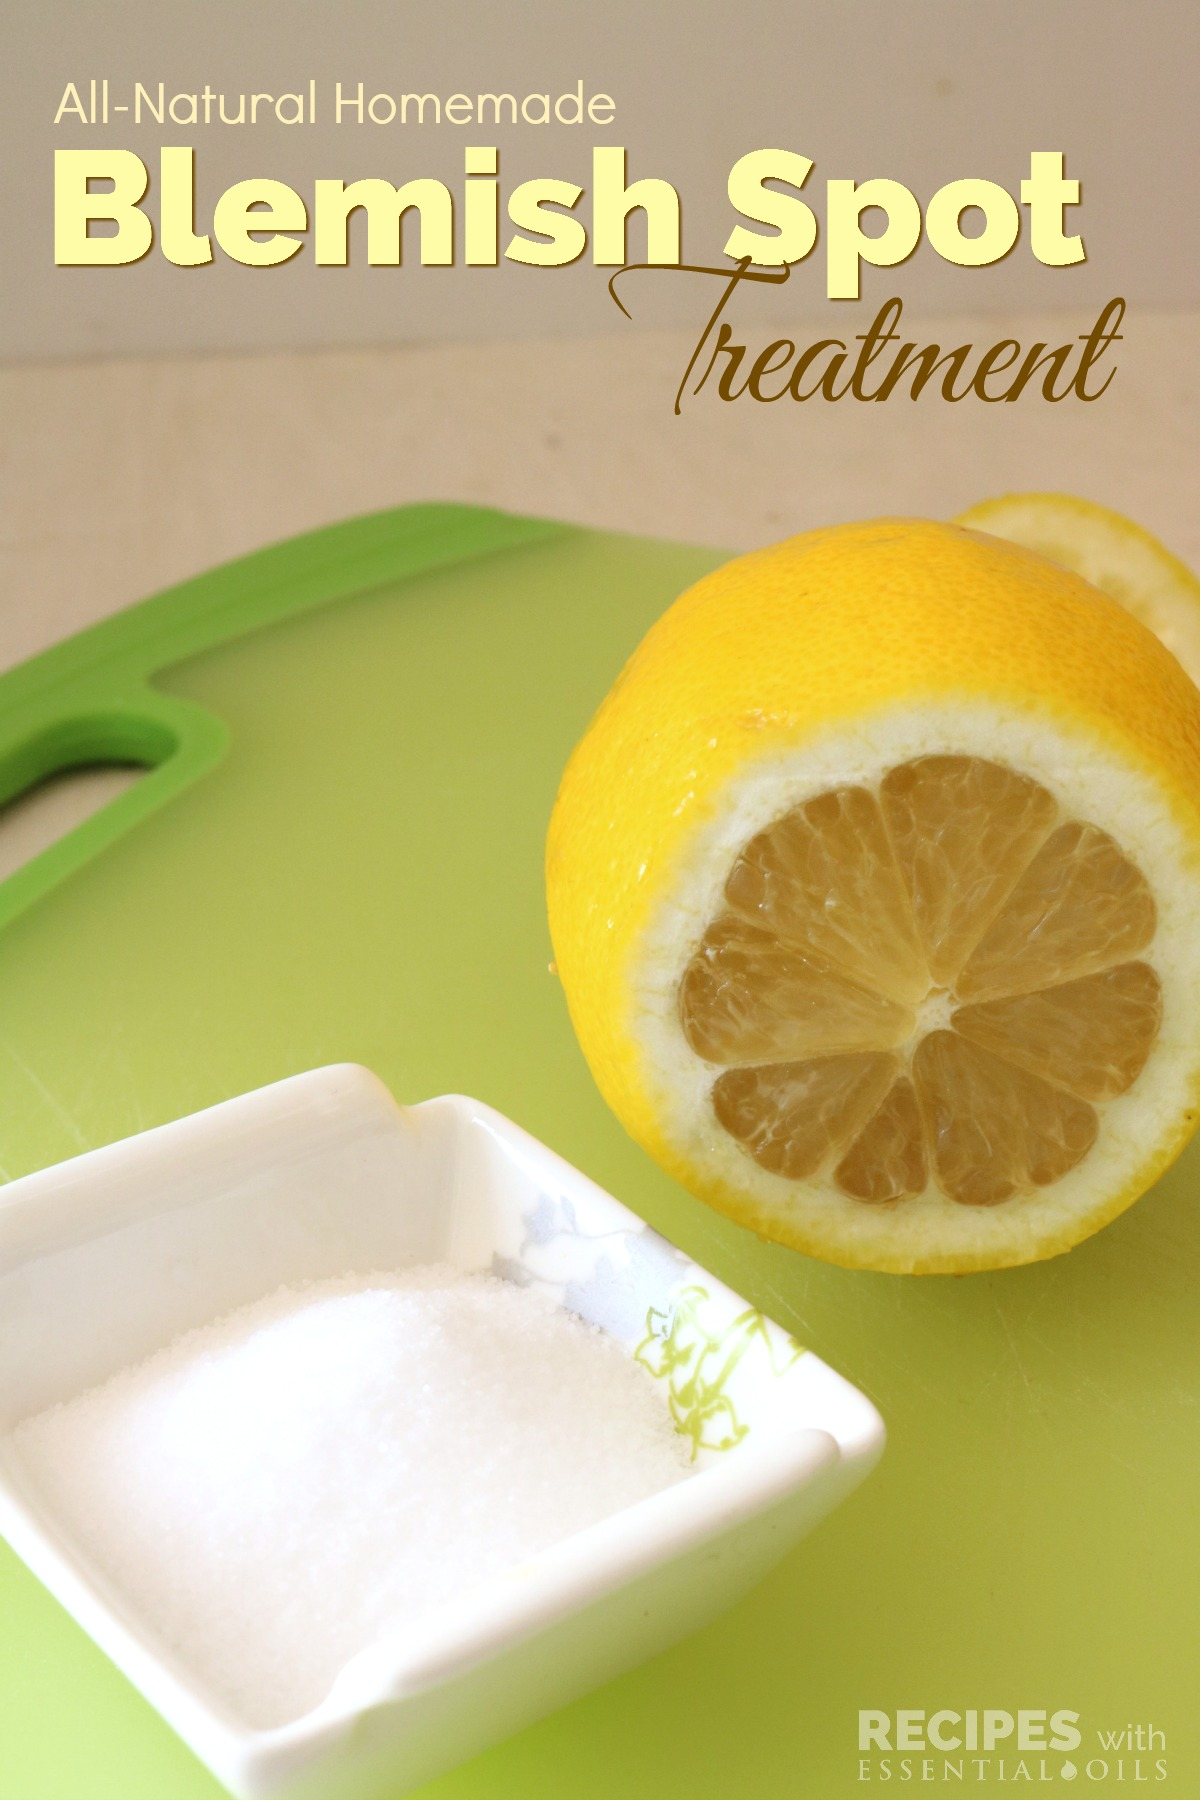 All Natural Homemade Recipe for a Blemish Spot Treatment from RecipeswithEssentialOils.com